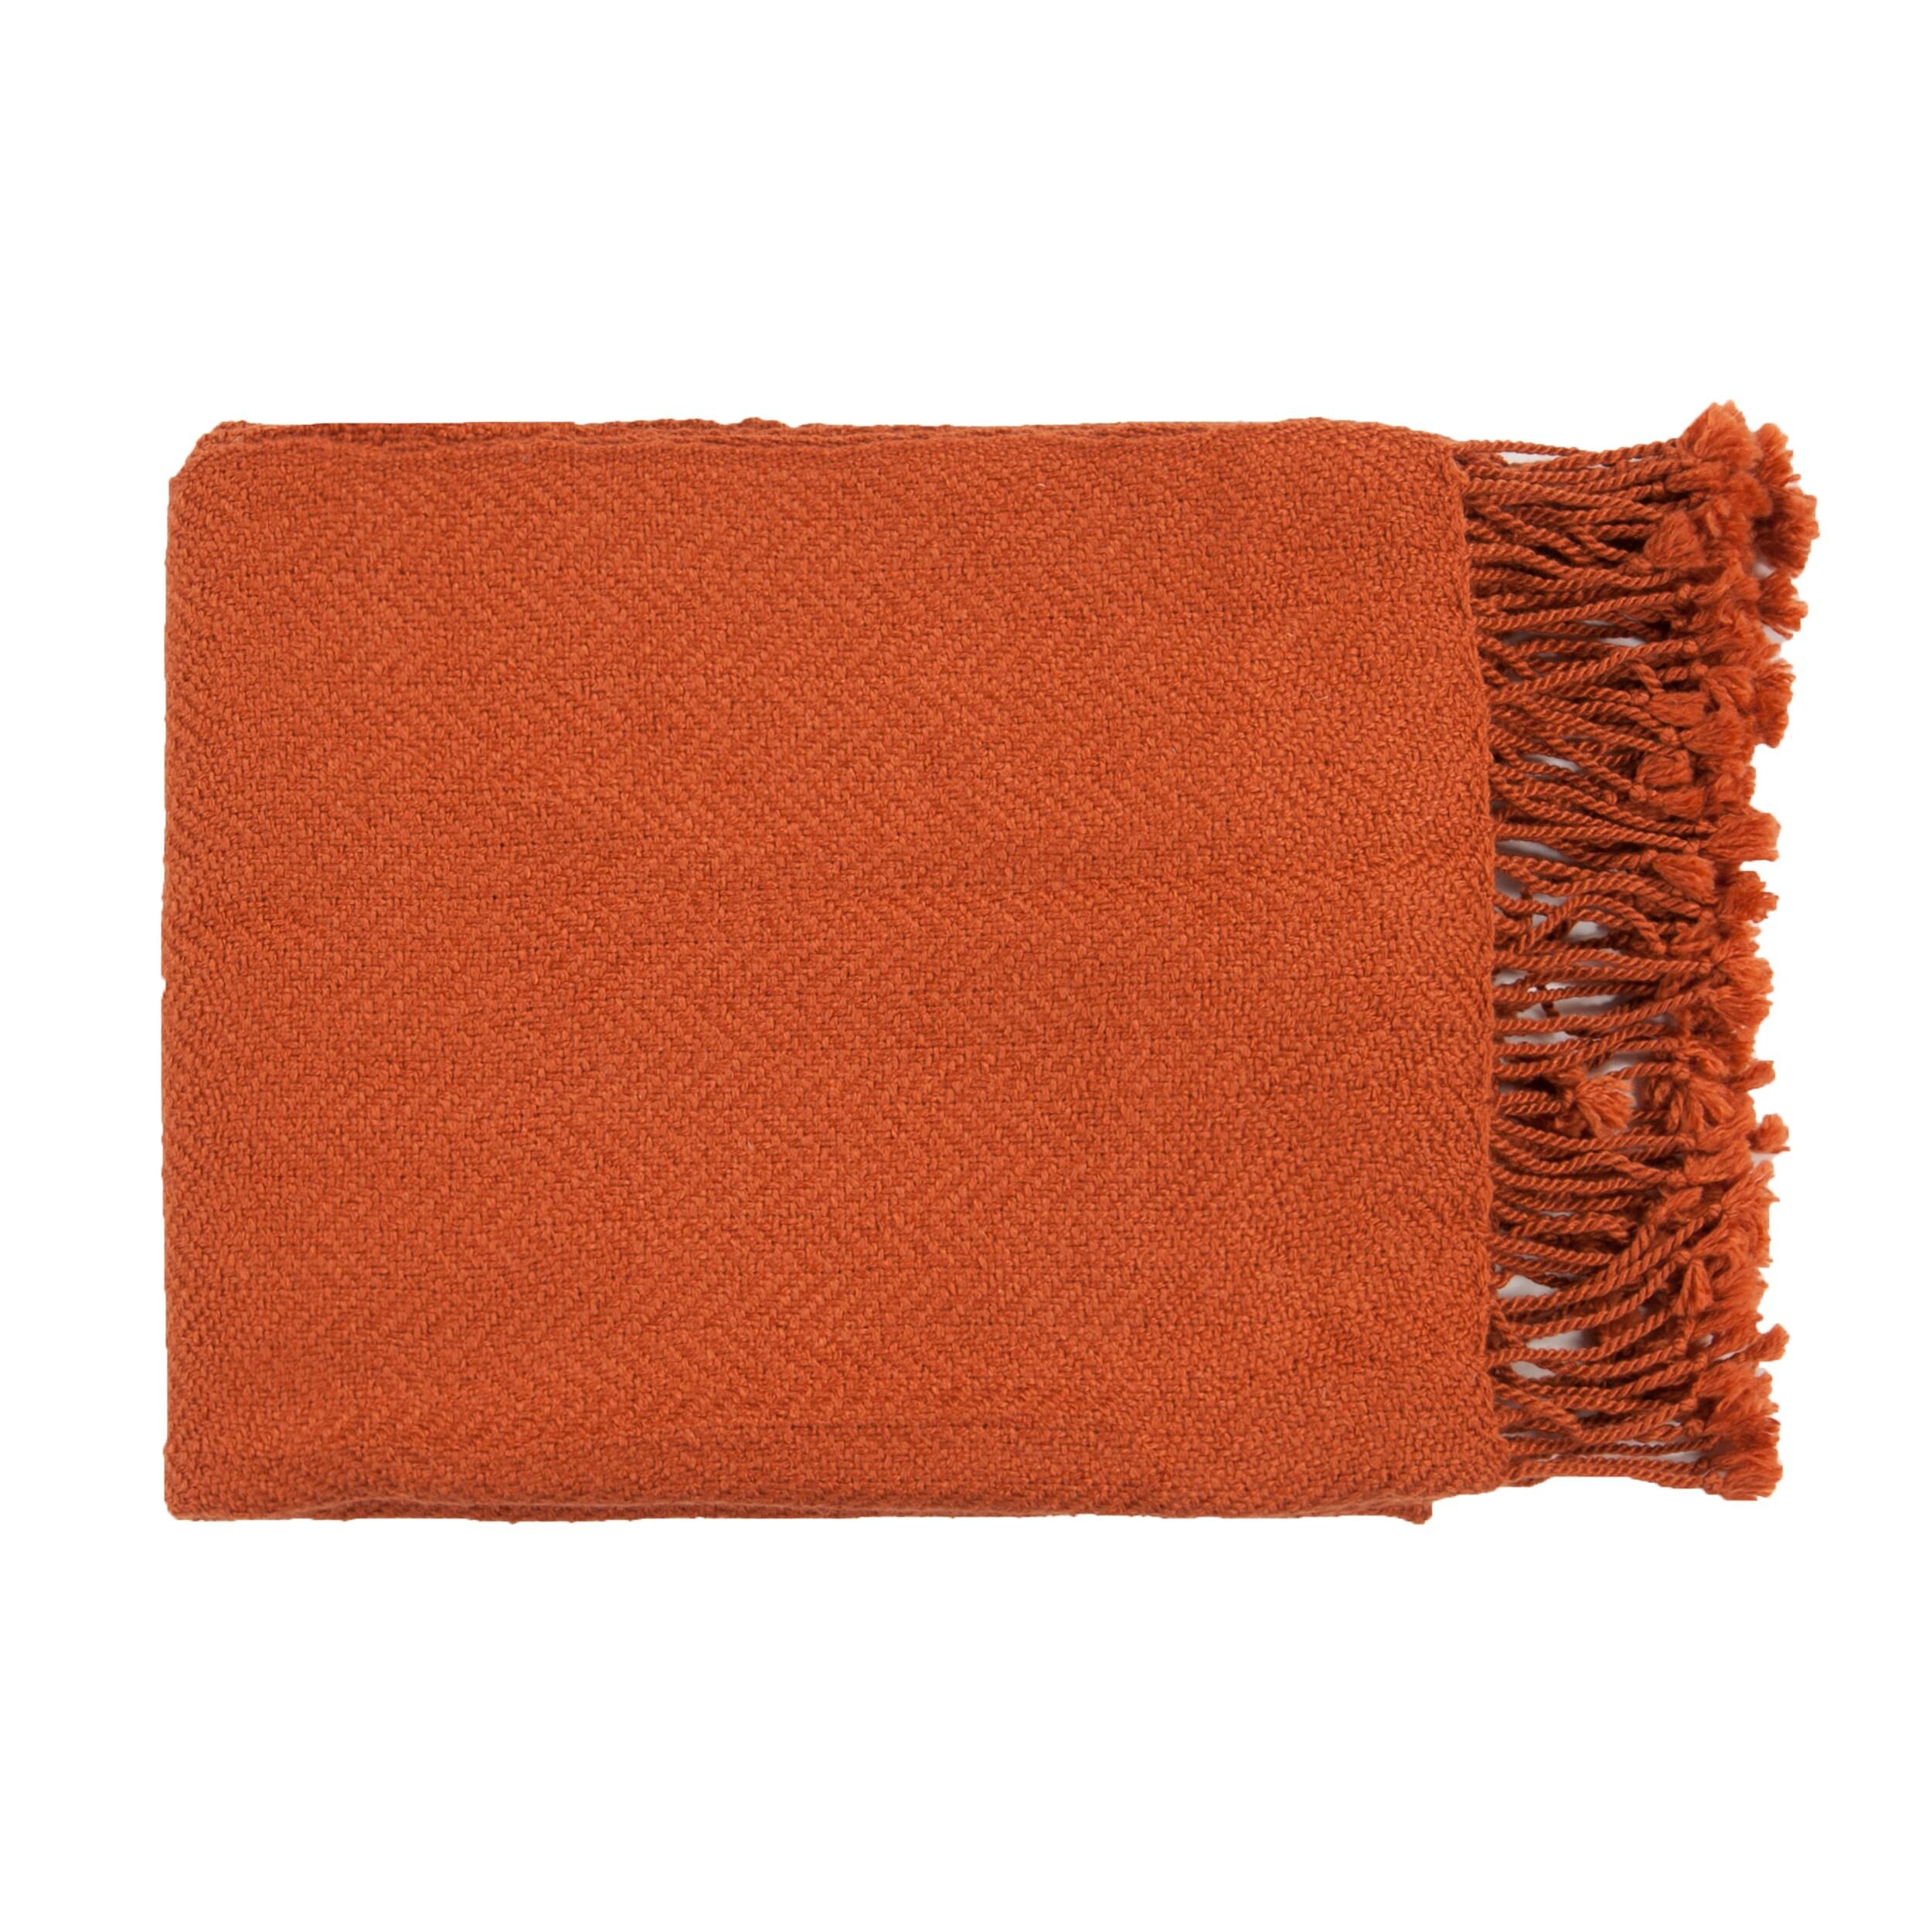 Woven Leafy Acrylic Throw Blanket (50 x 60)